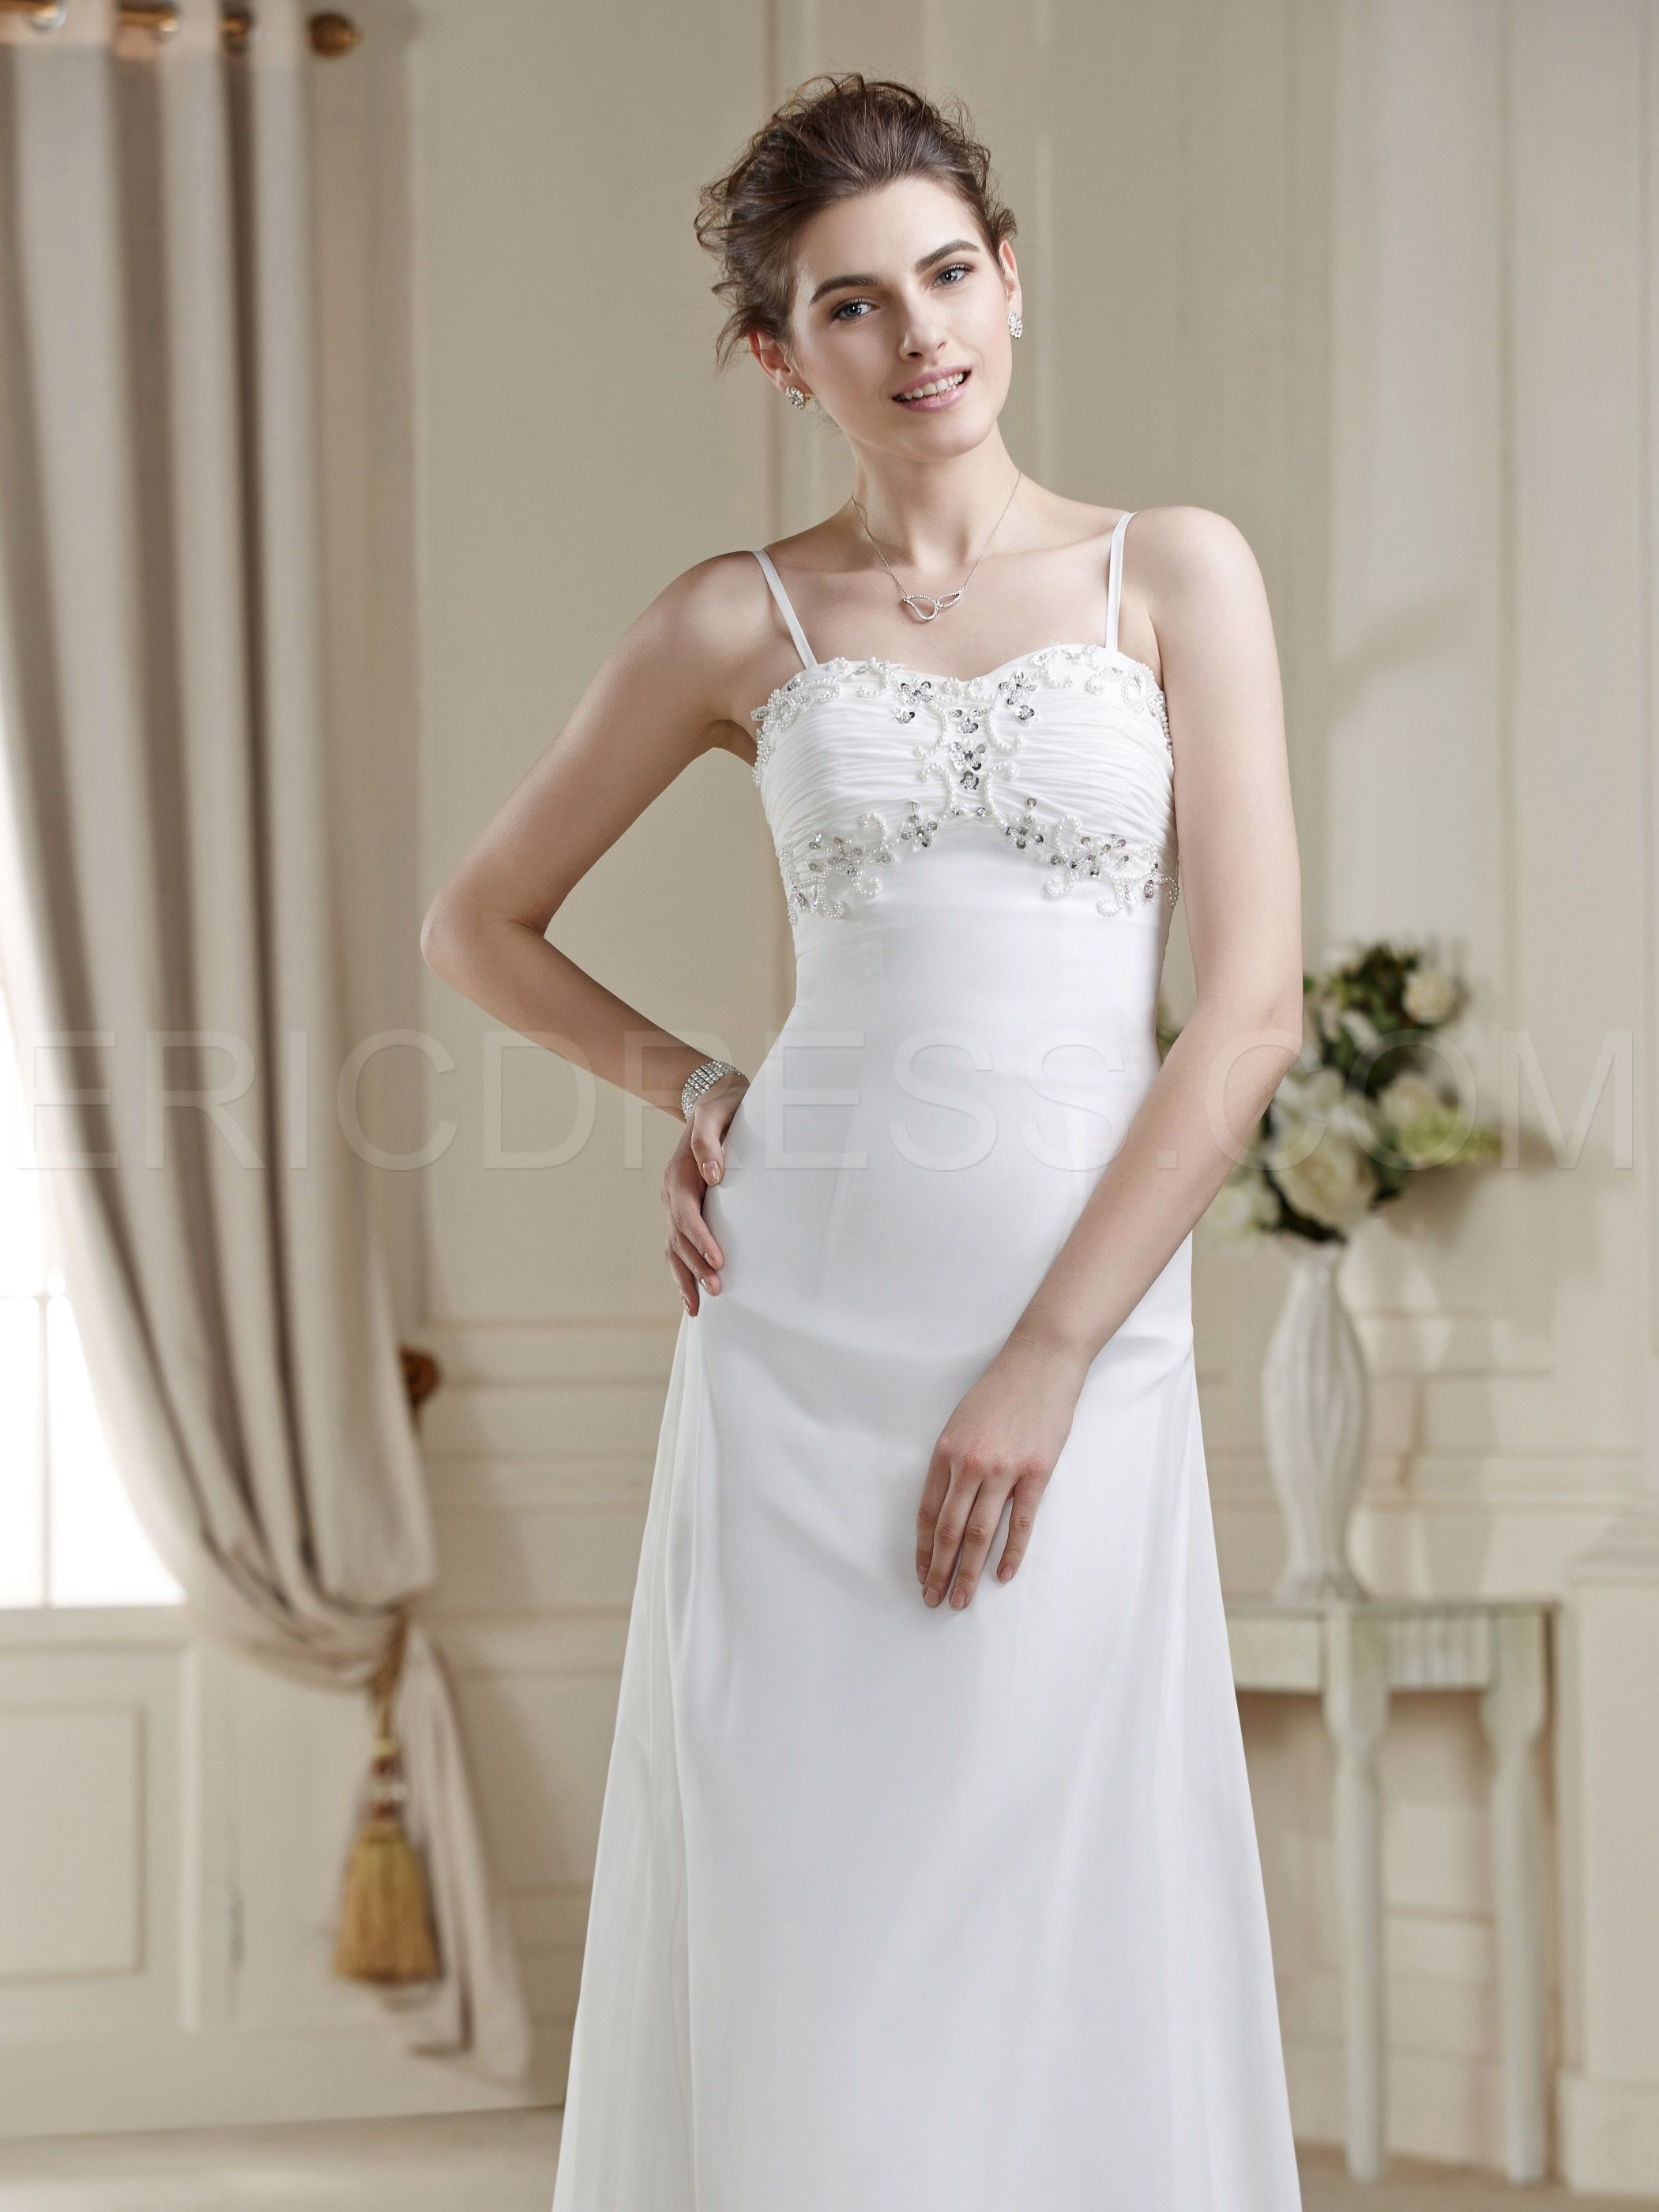 Aline Asymmetry Spaghetti Strap Zipperup Sequins Wedding